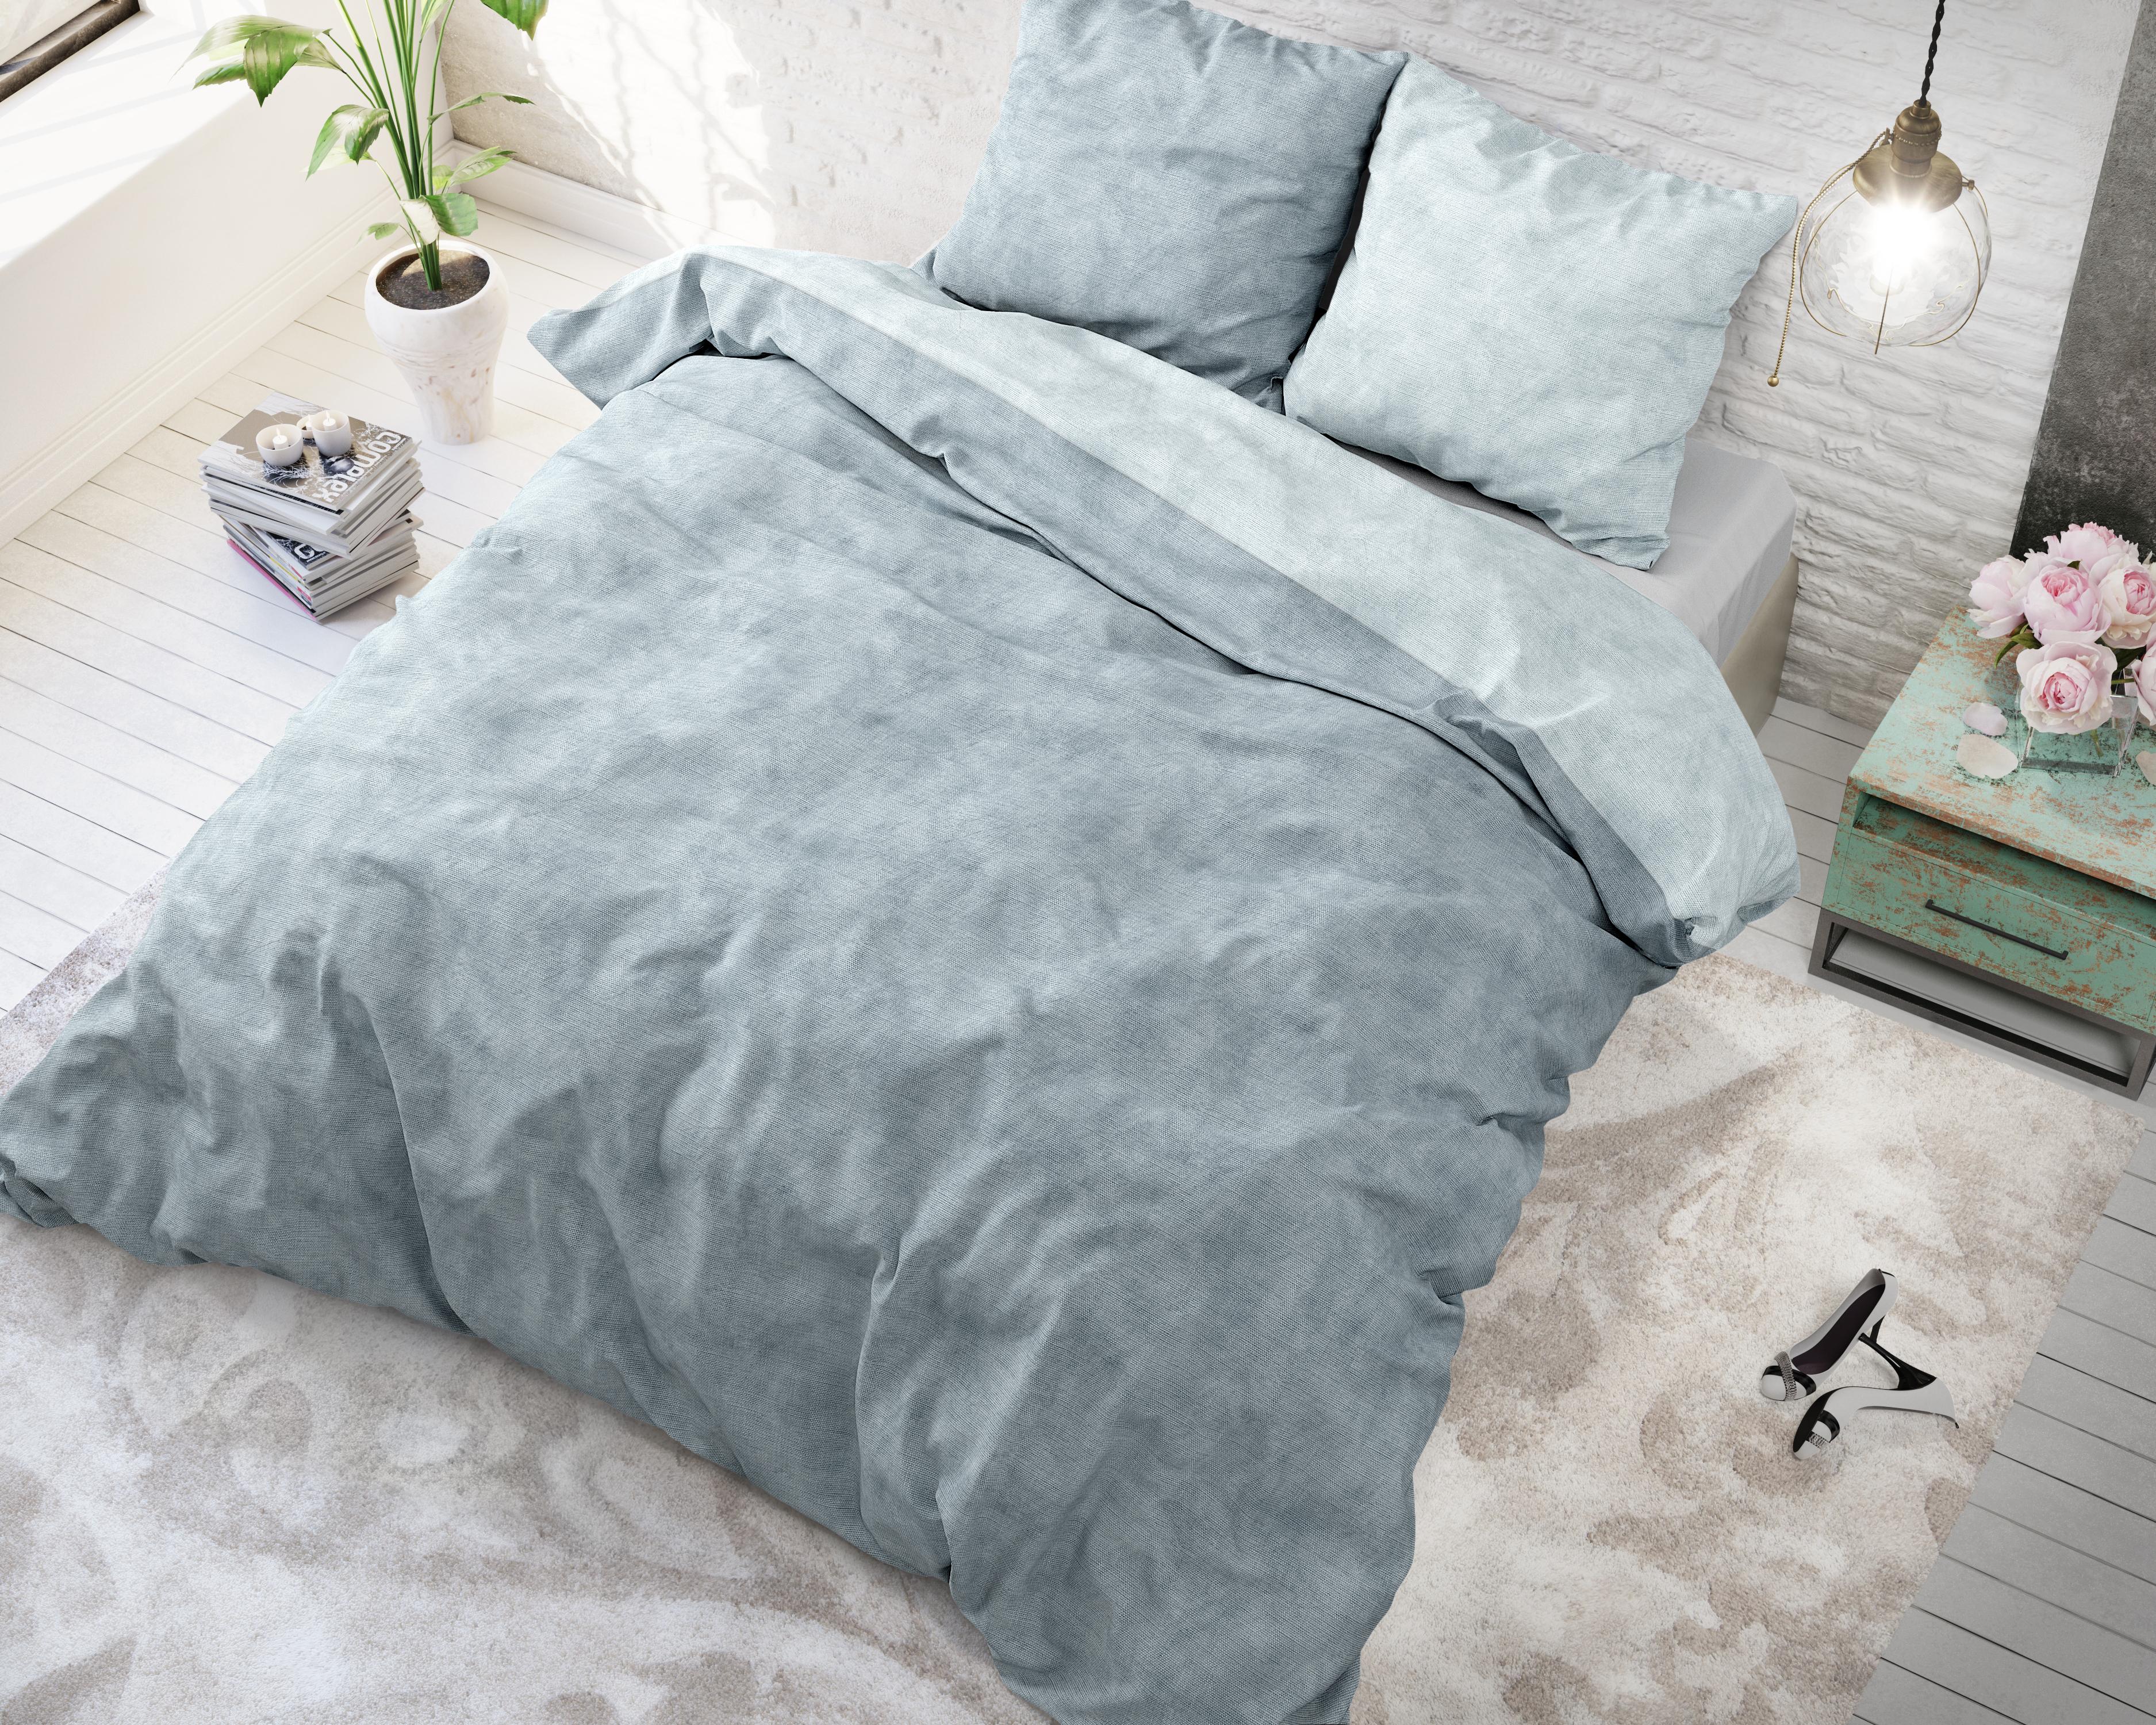 Dekbedovertrek Sleeptime Flanel Twin Washed Cotton Blue